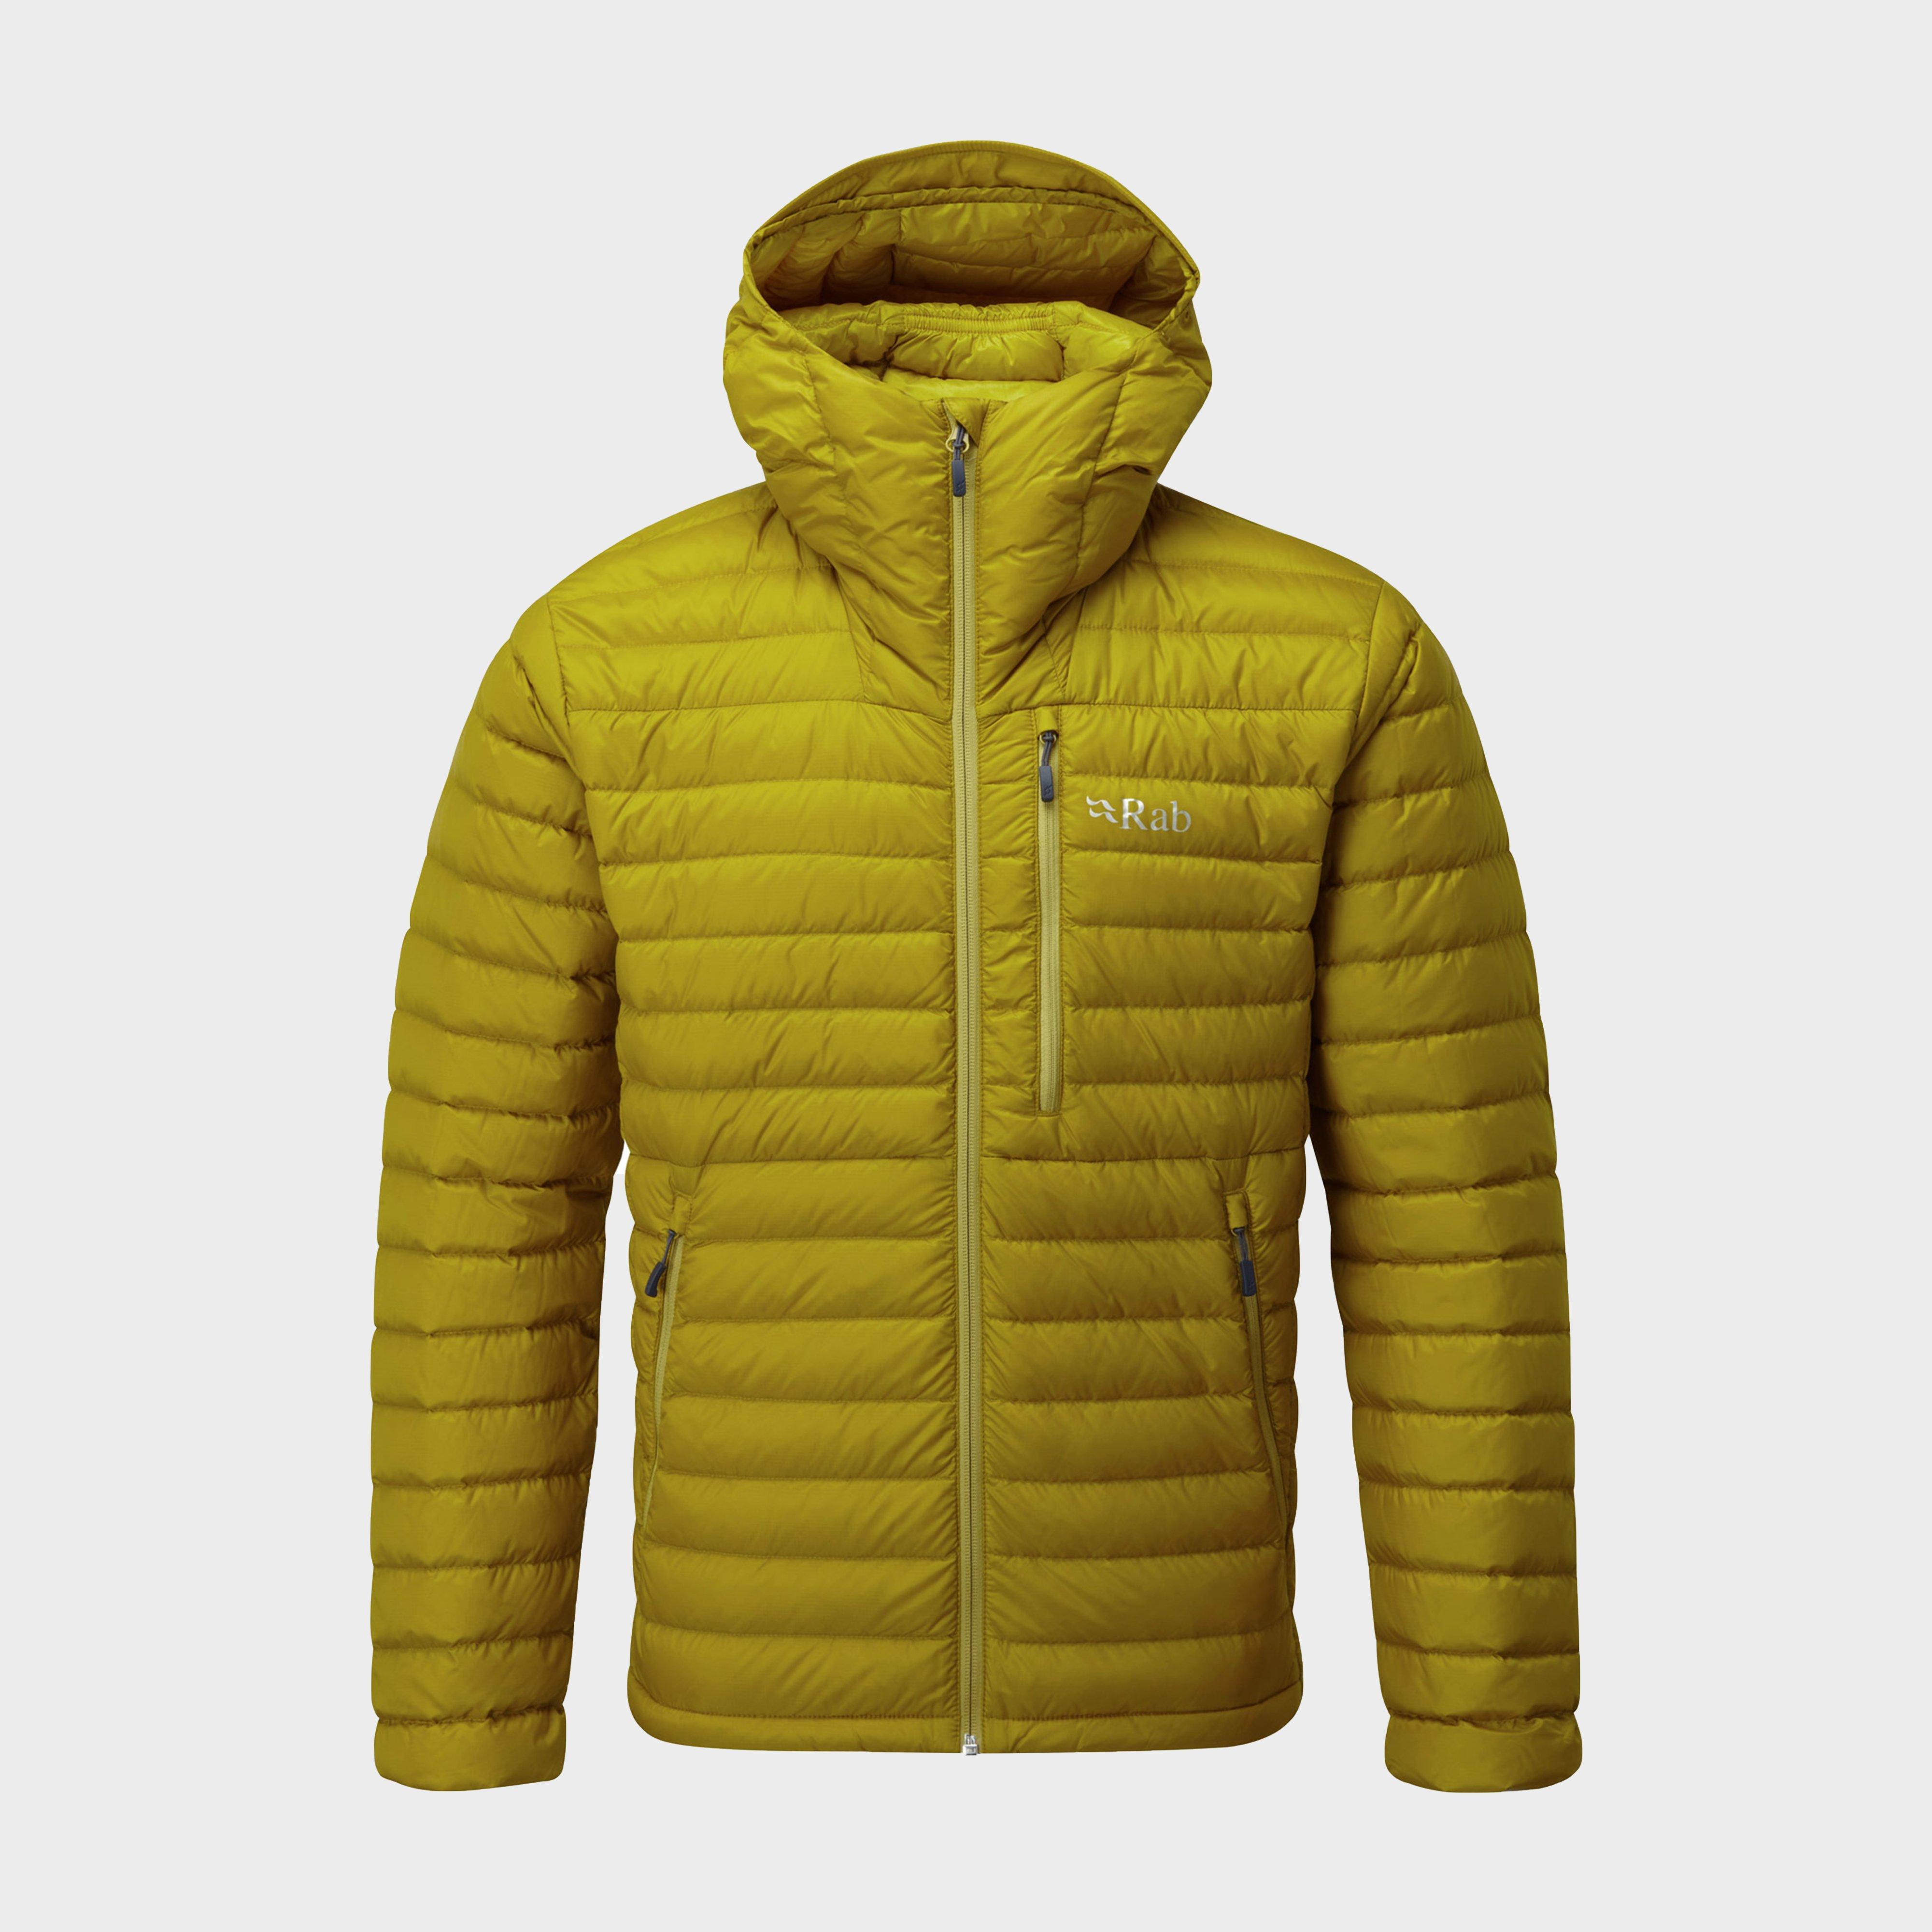 Rab Rab Mens Microlight Alpine Down Jacket - N/A, N/A